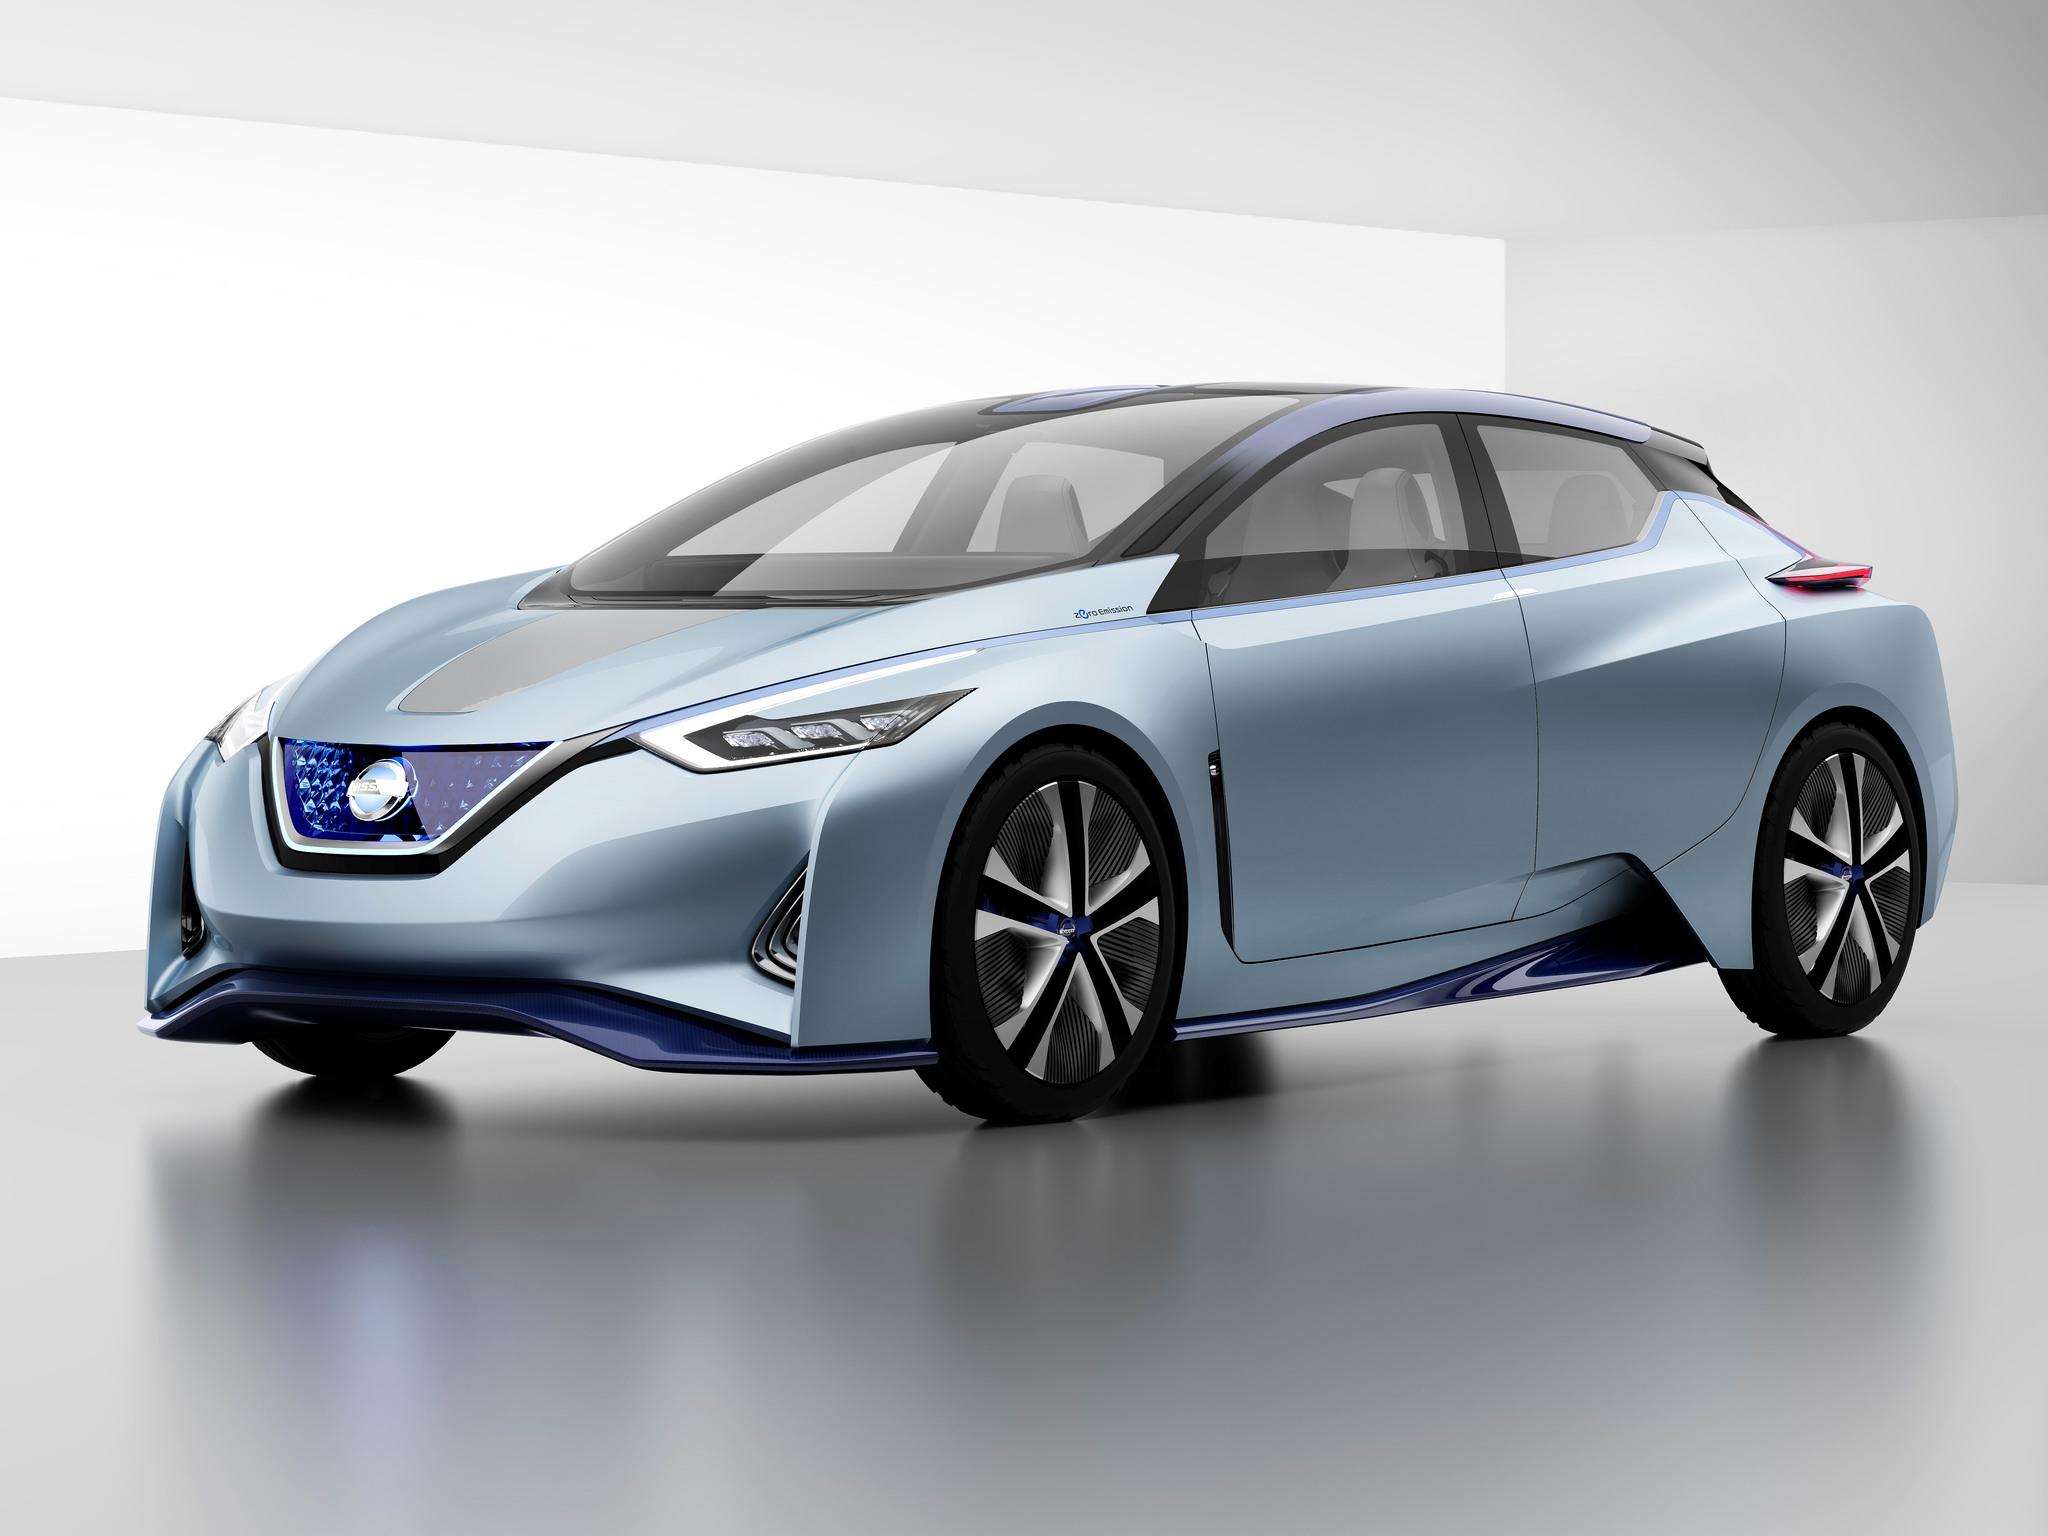 Nissan IDS driver-less car